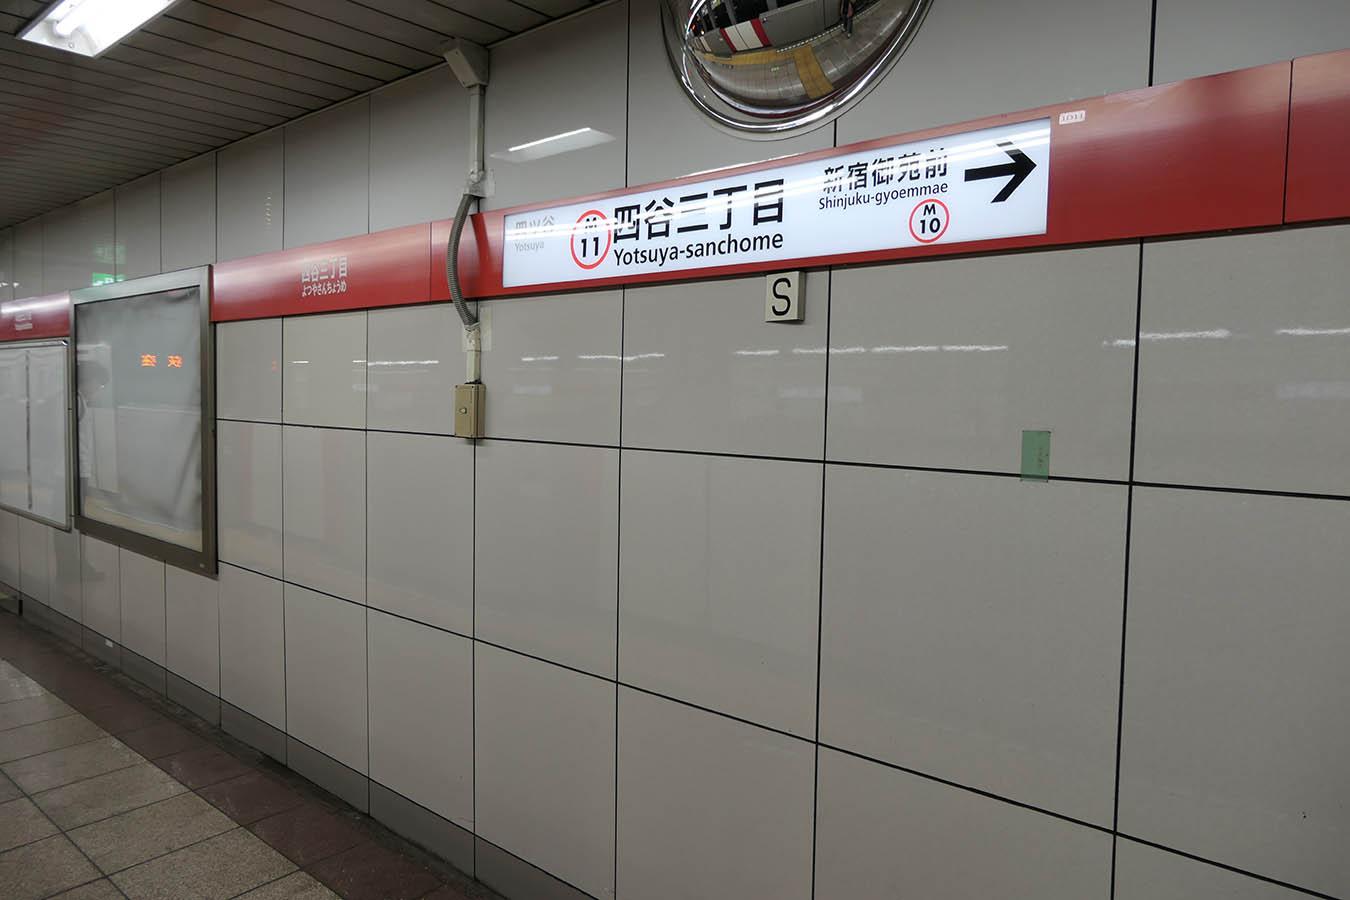 M11_photo01.jpg